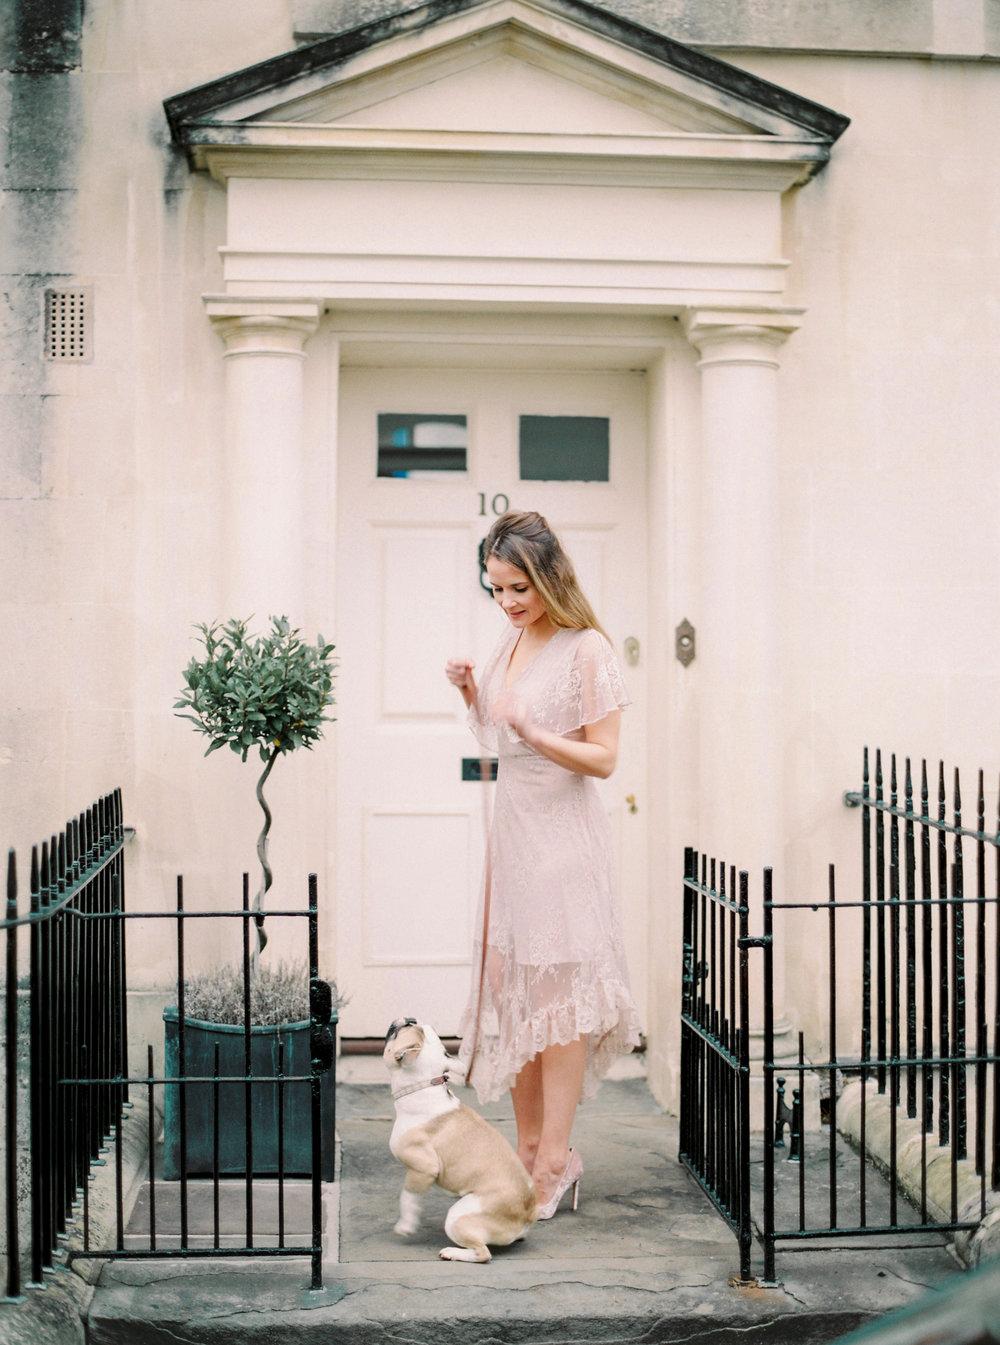 Luxury Wedding Planner UK | Our Chic & Romantic Engagement Shoot in Bath | Katie Julia Photography - 35.JPG